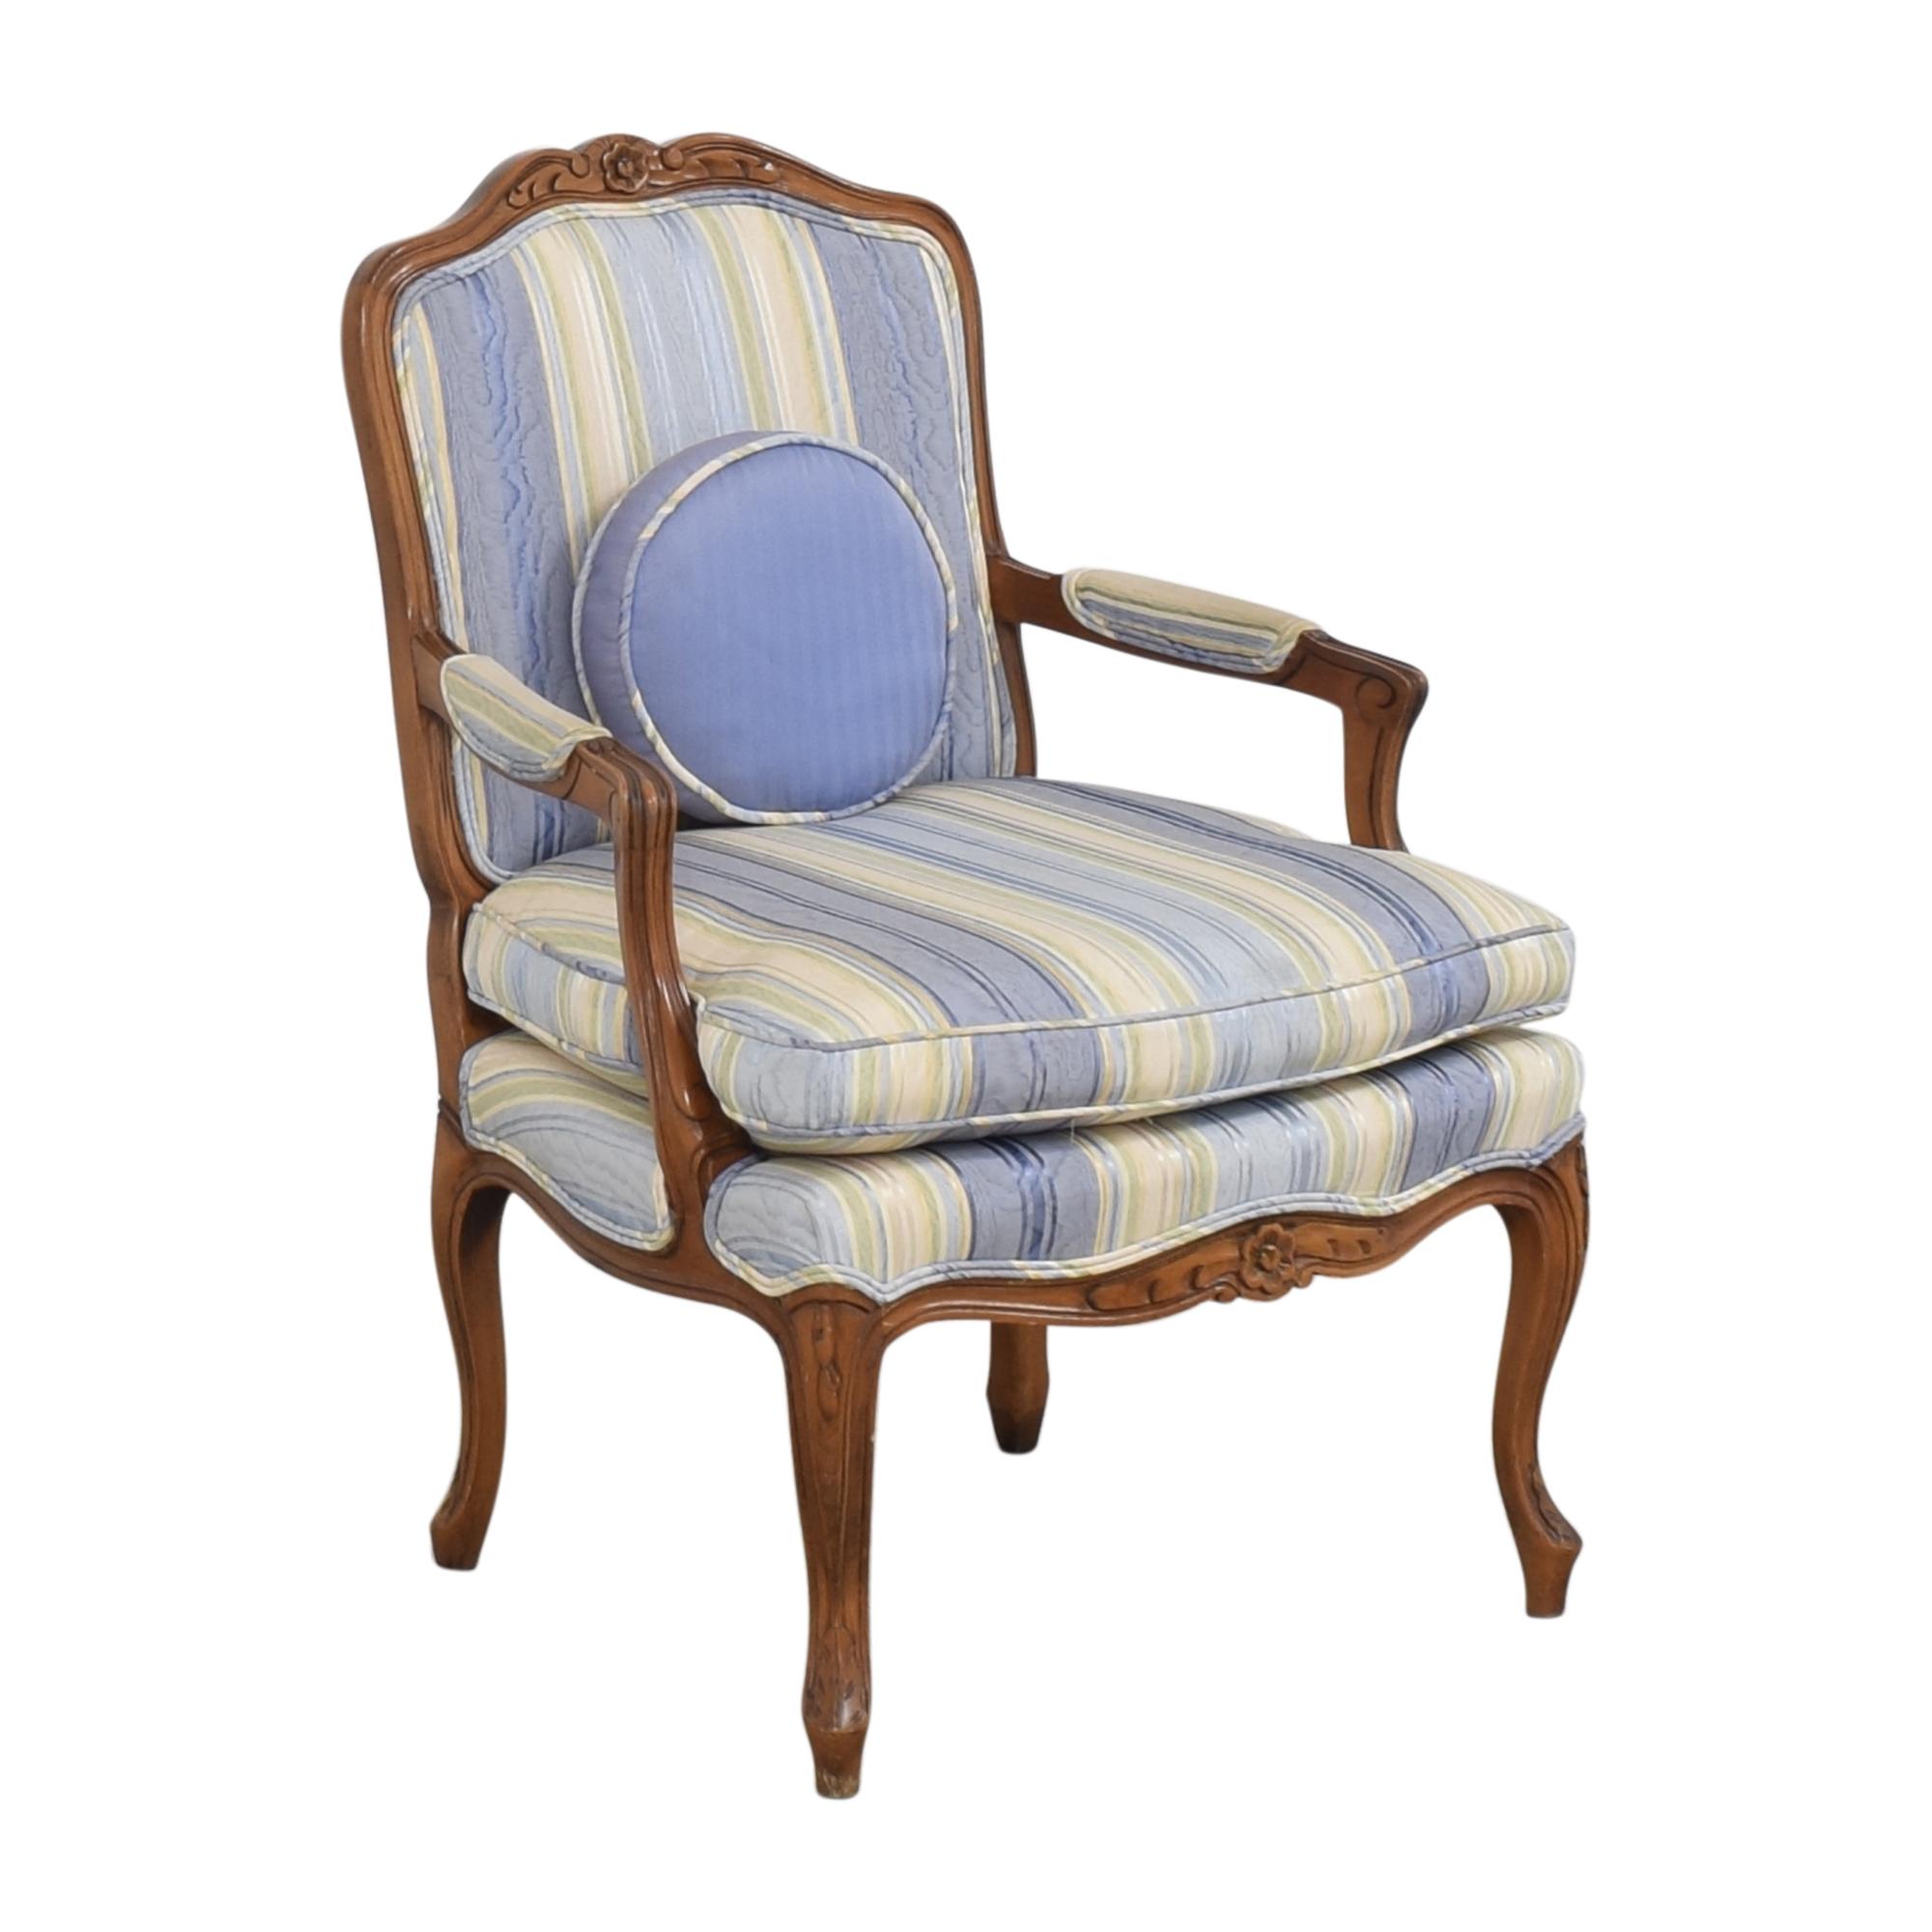 Ethan Allen Ethan Allen Accent Chair ct